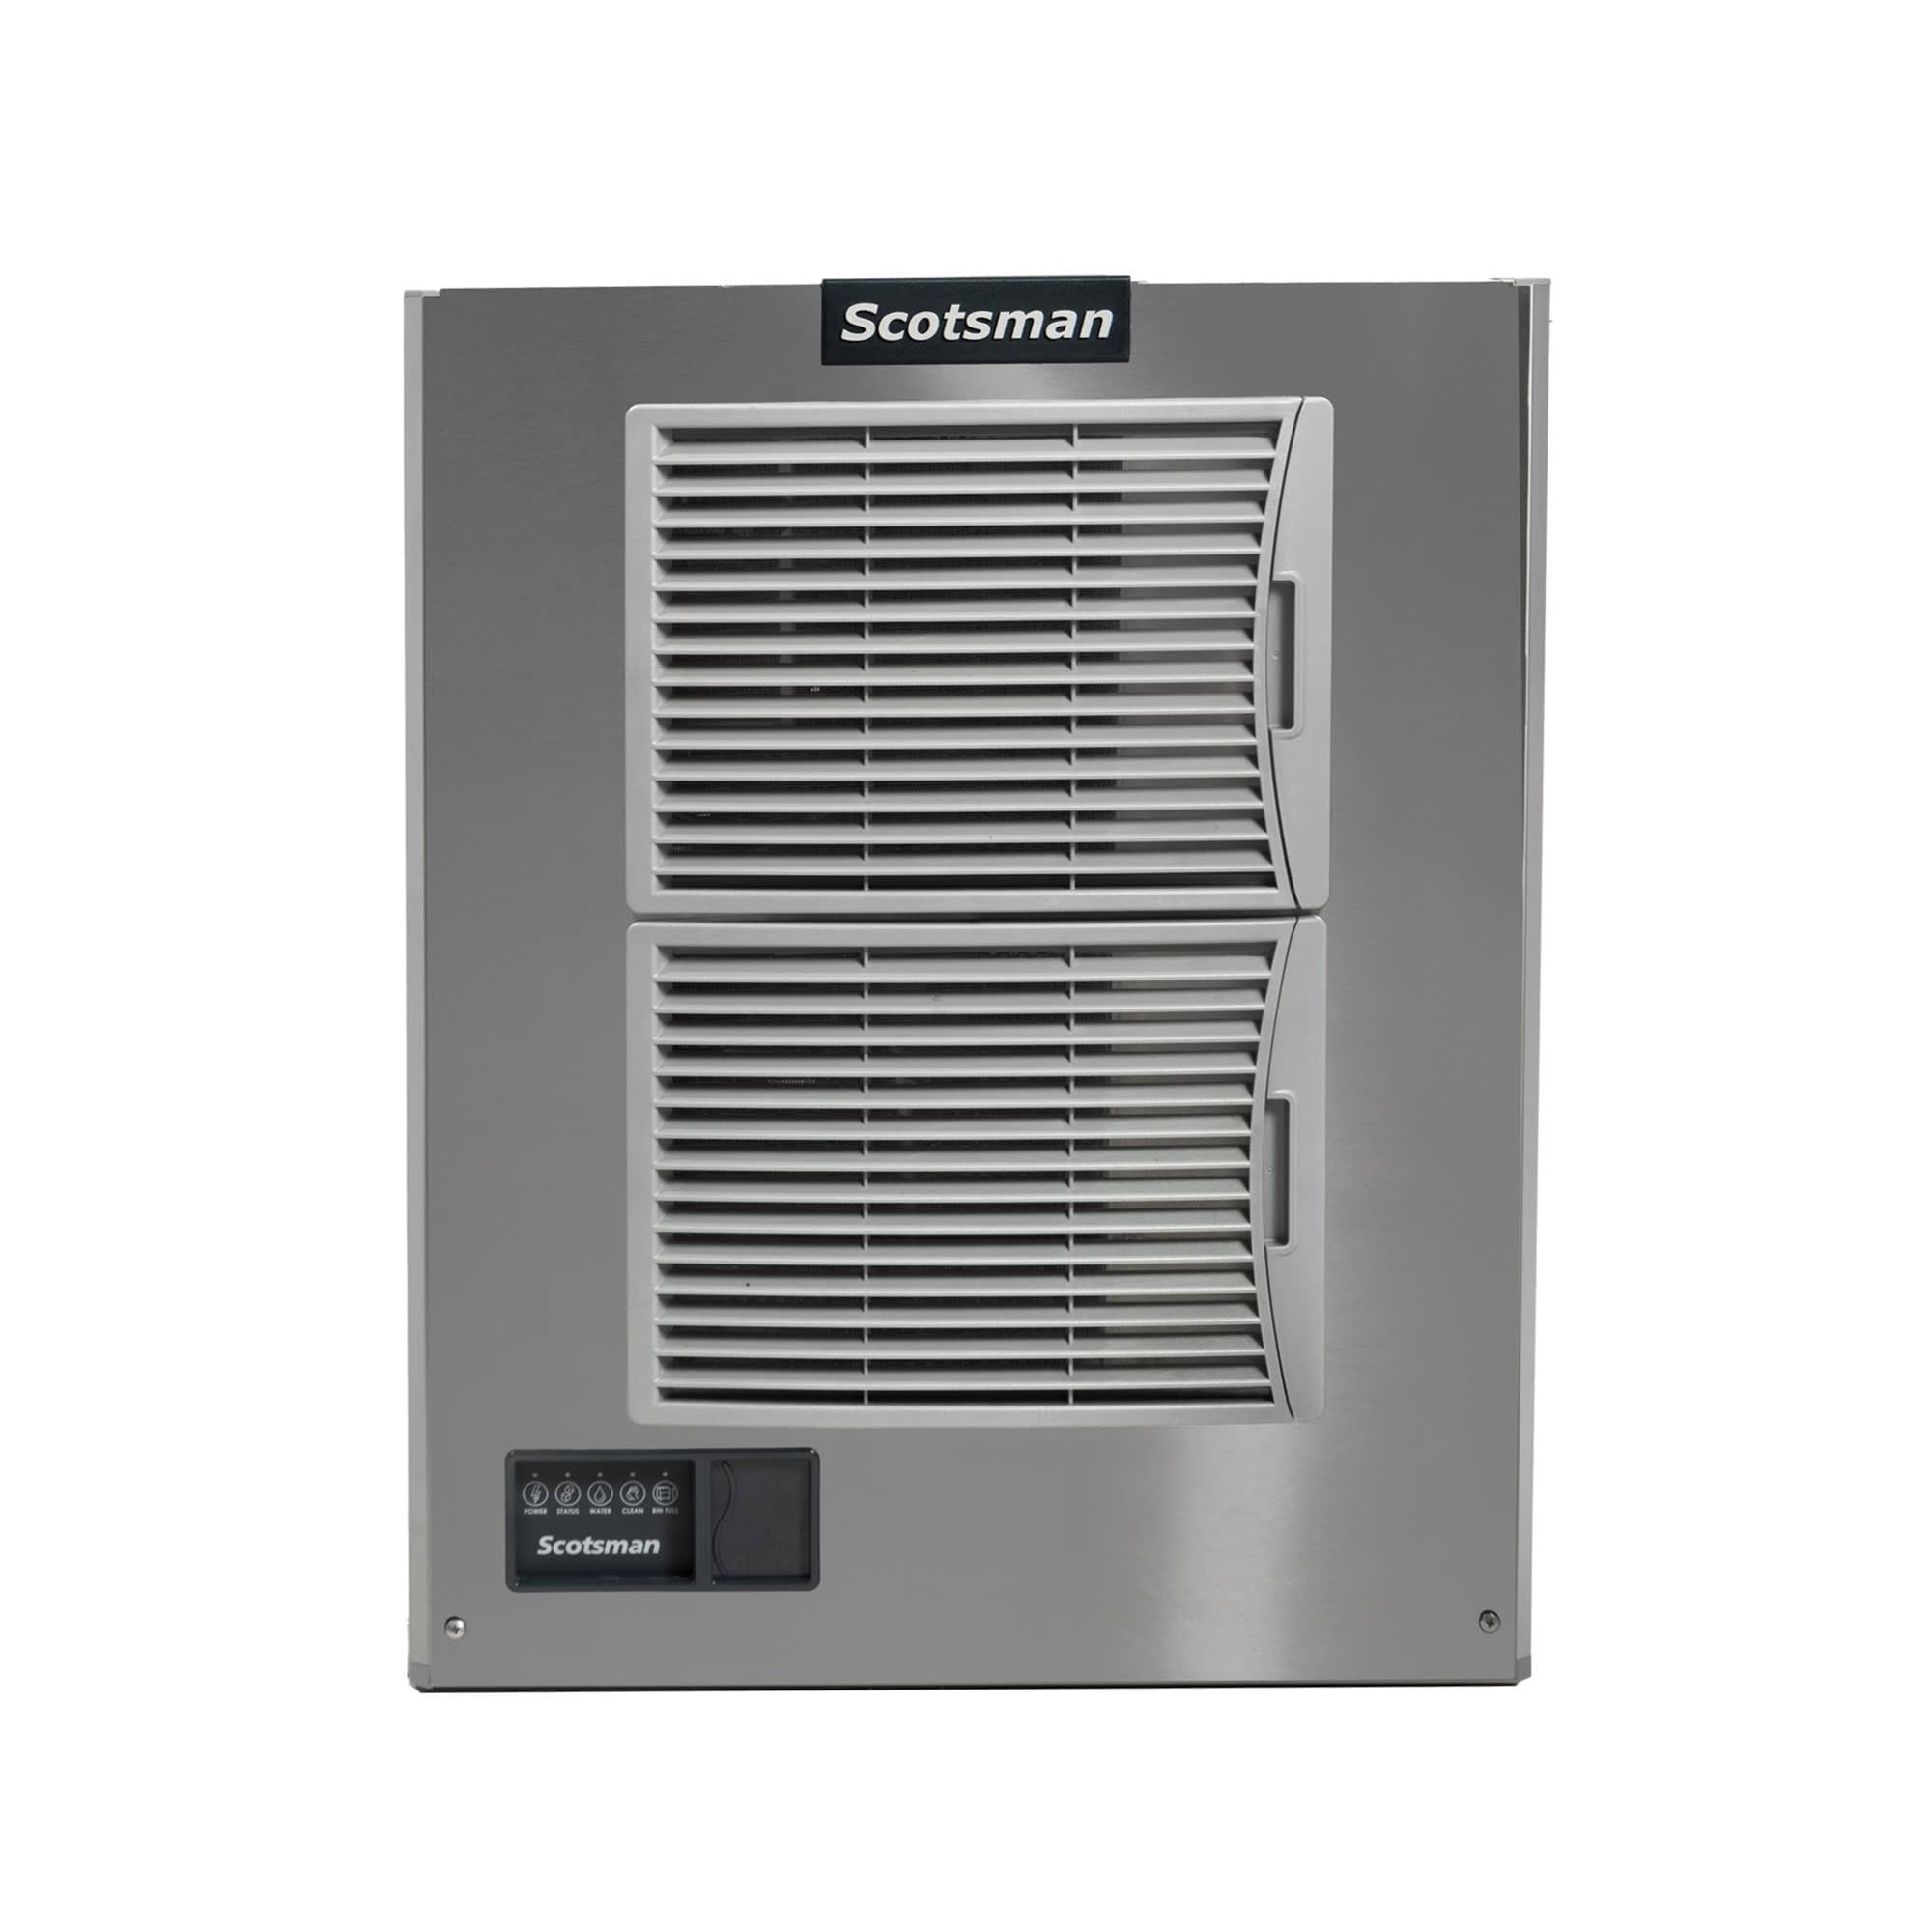 "Scotsman C0722SA-32 22"" Prodigy Plus® Half Cube Ice Machine Head - 758 lb/day, Air Cooled, 208 230v/1ph"